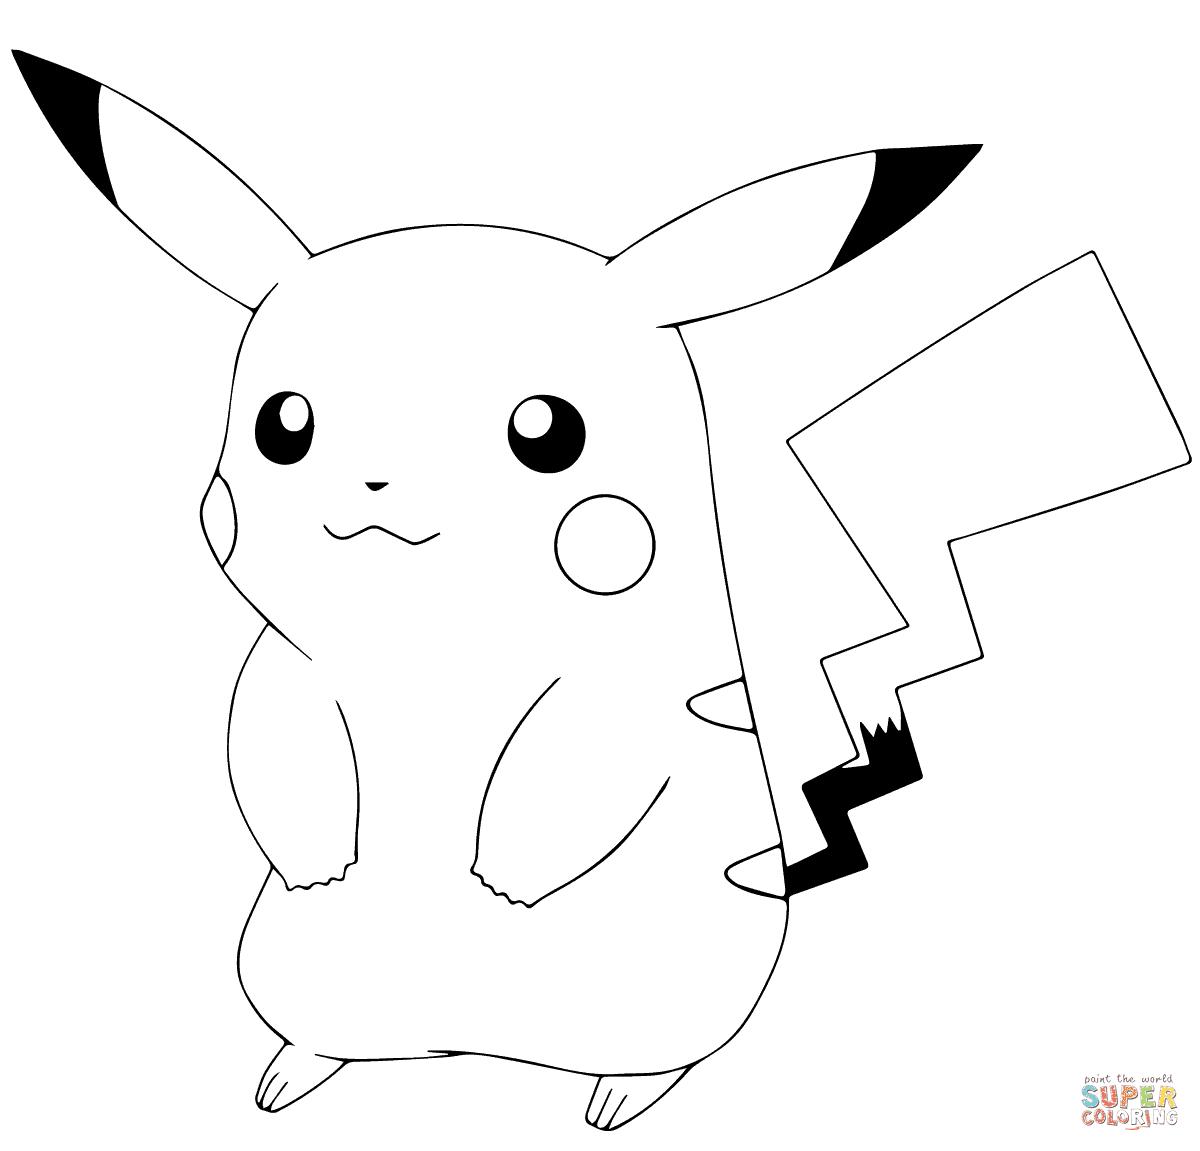 the Pokémon GO Pikachu